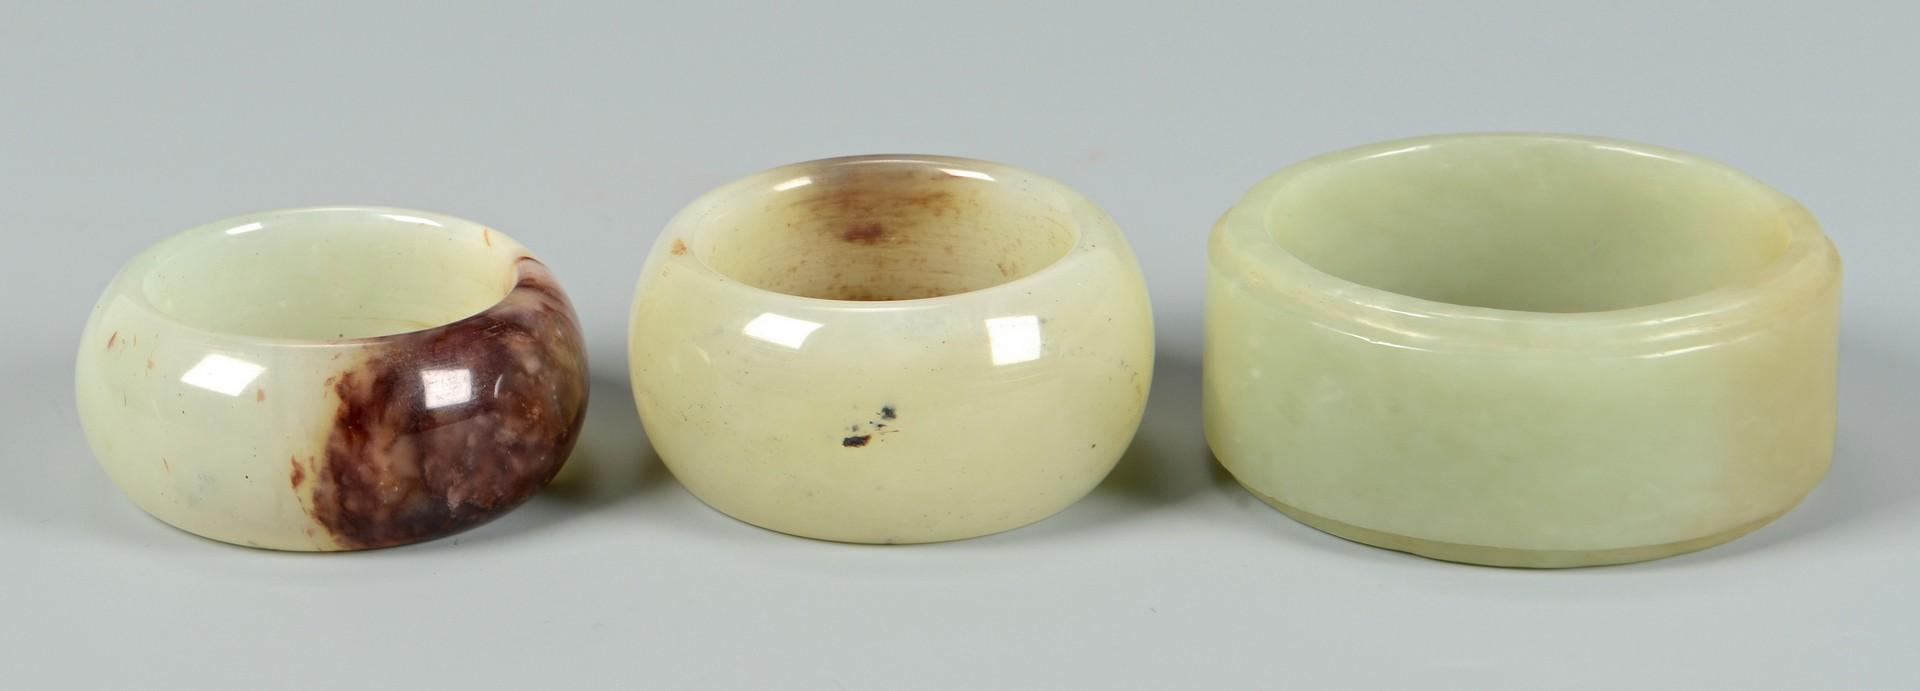 Lot 3832368: 4 Chinese Hardstone & Jade Bangles